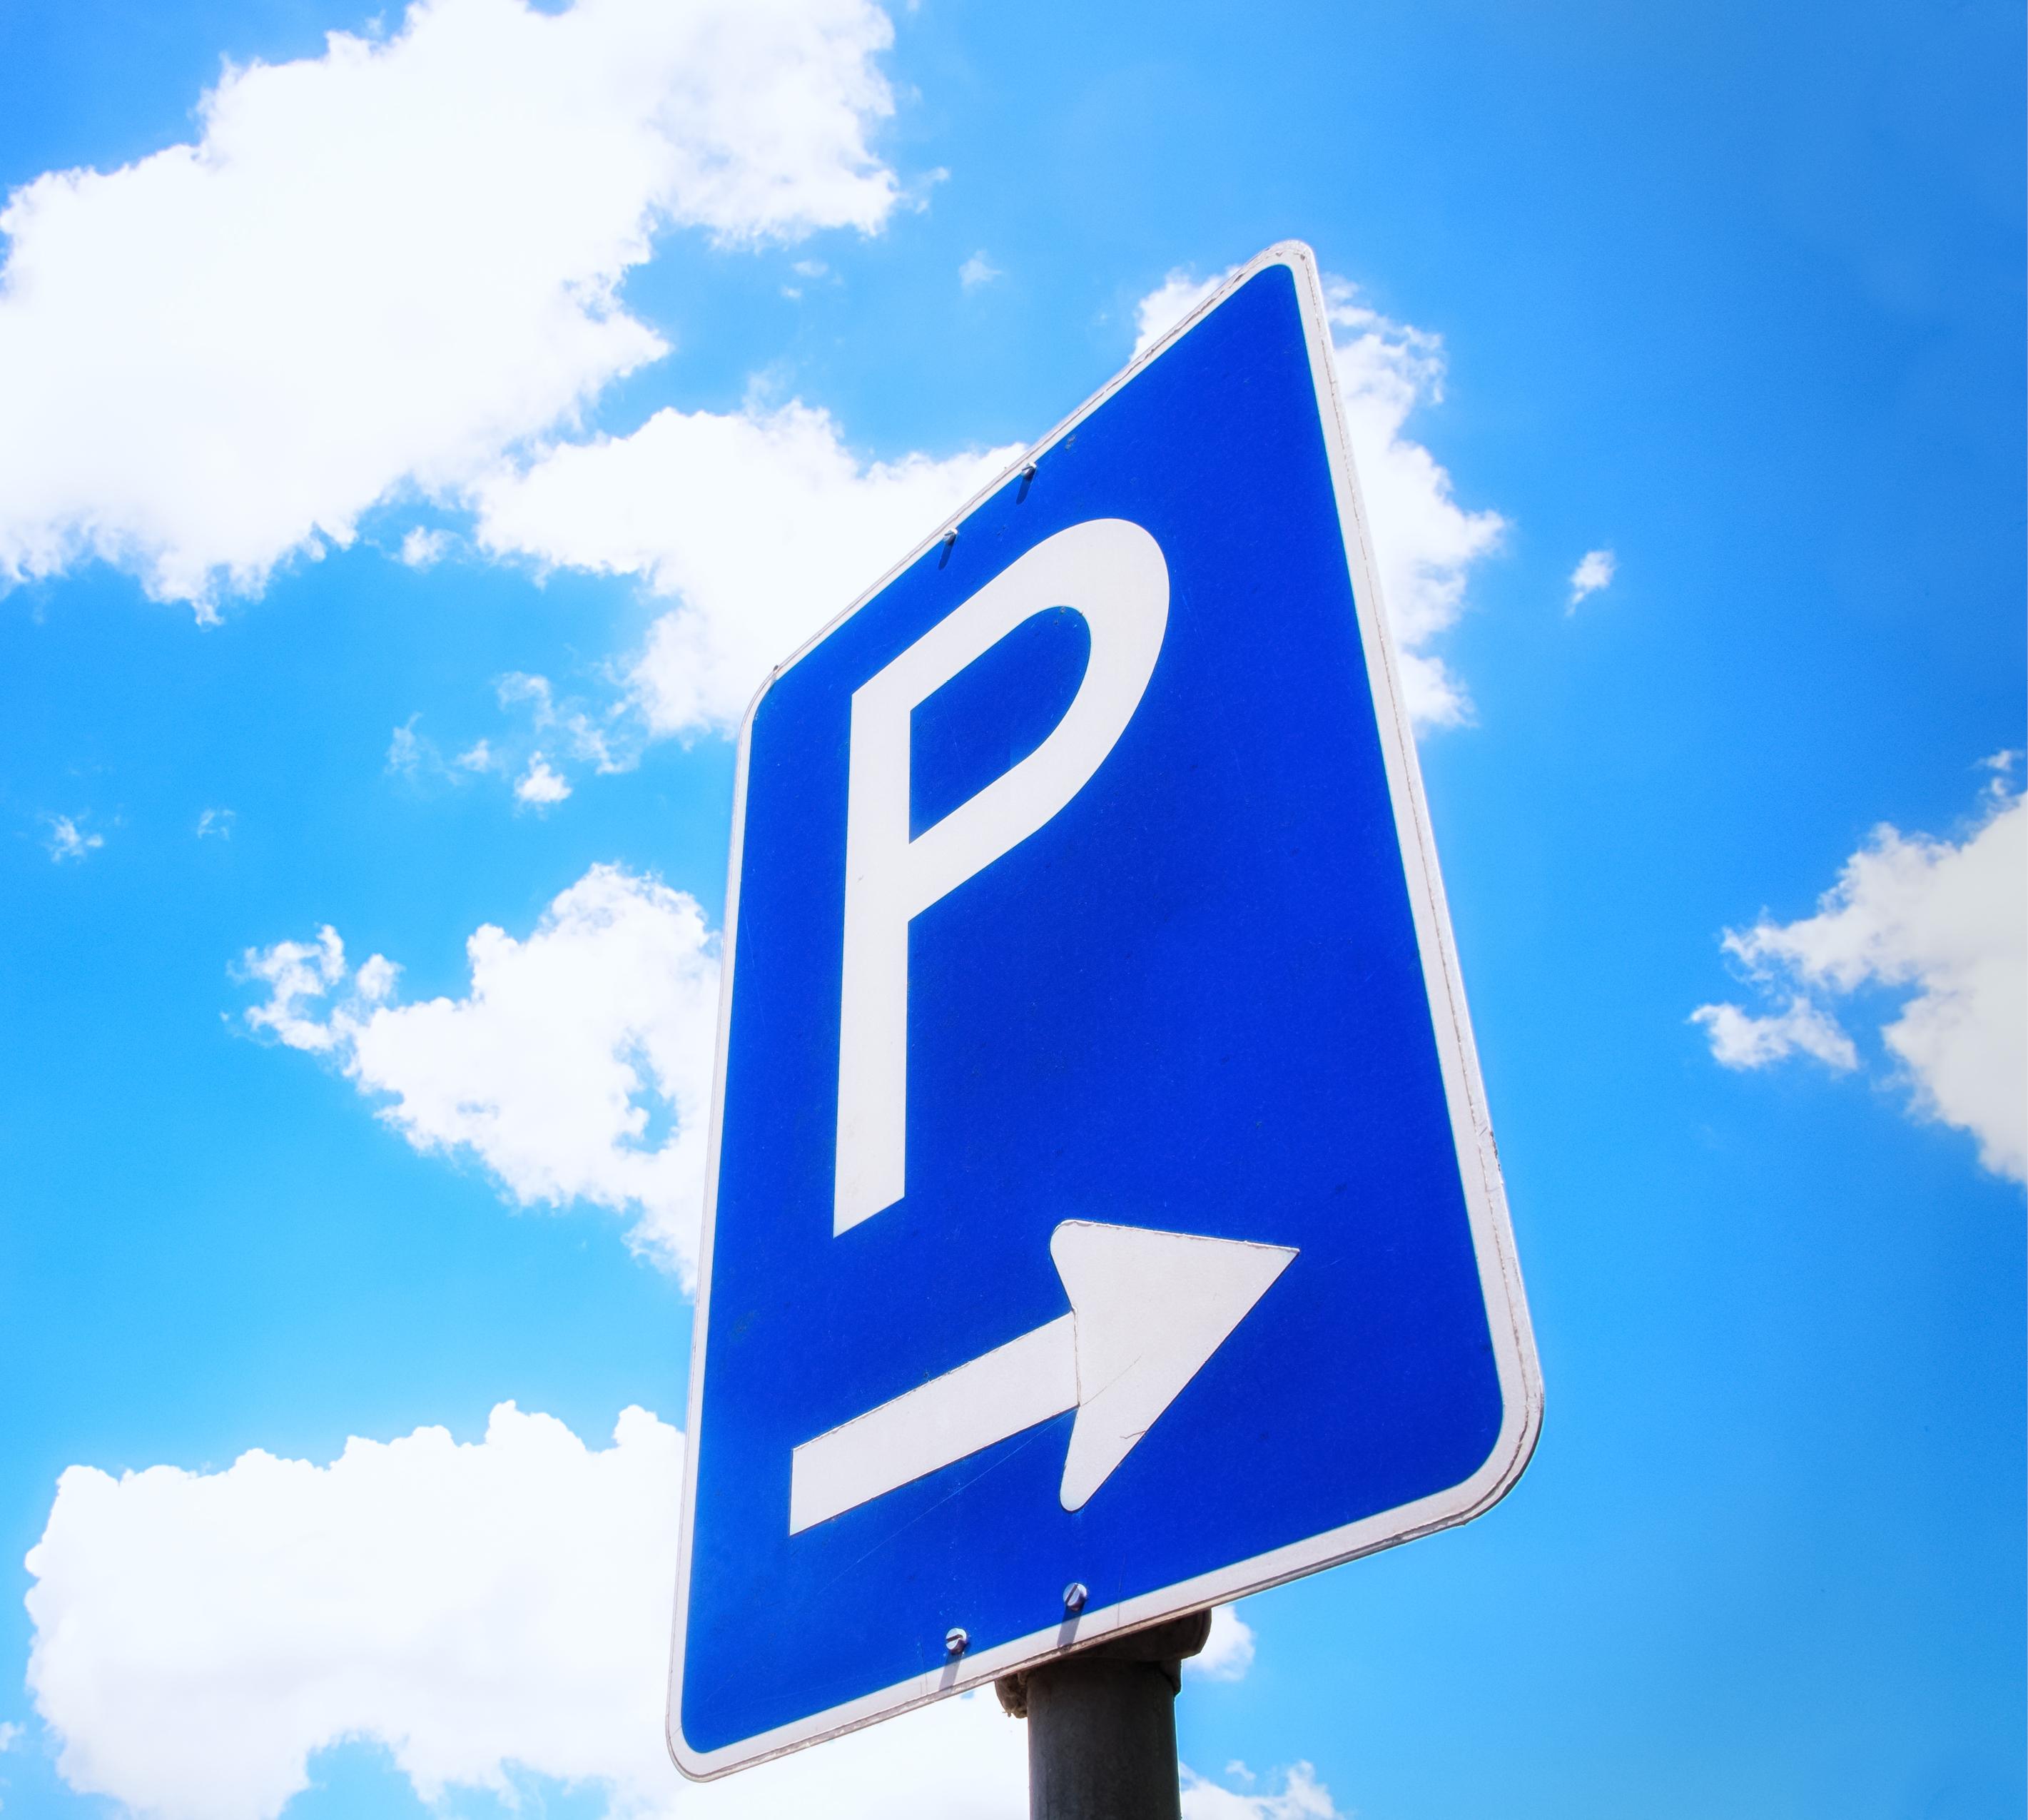 parking-682x612